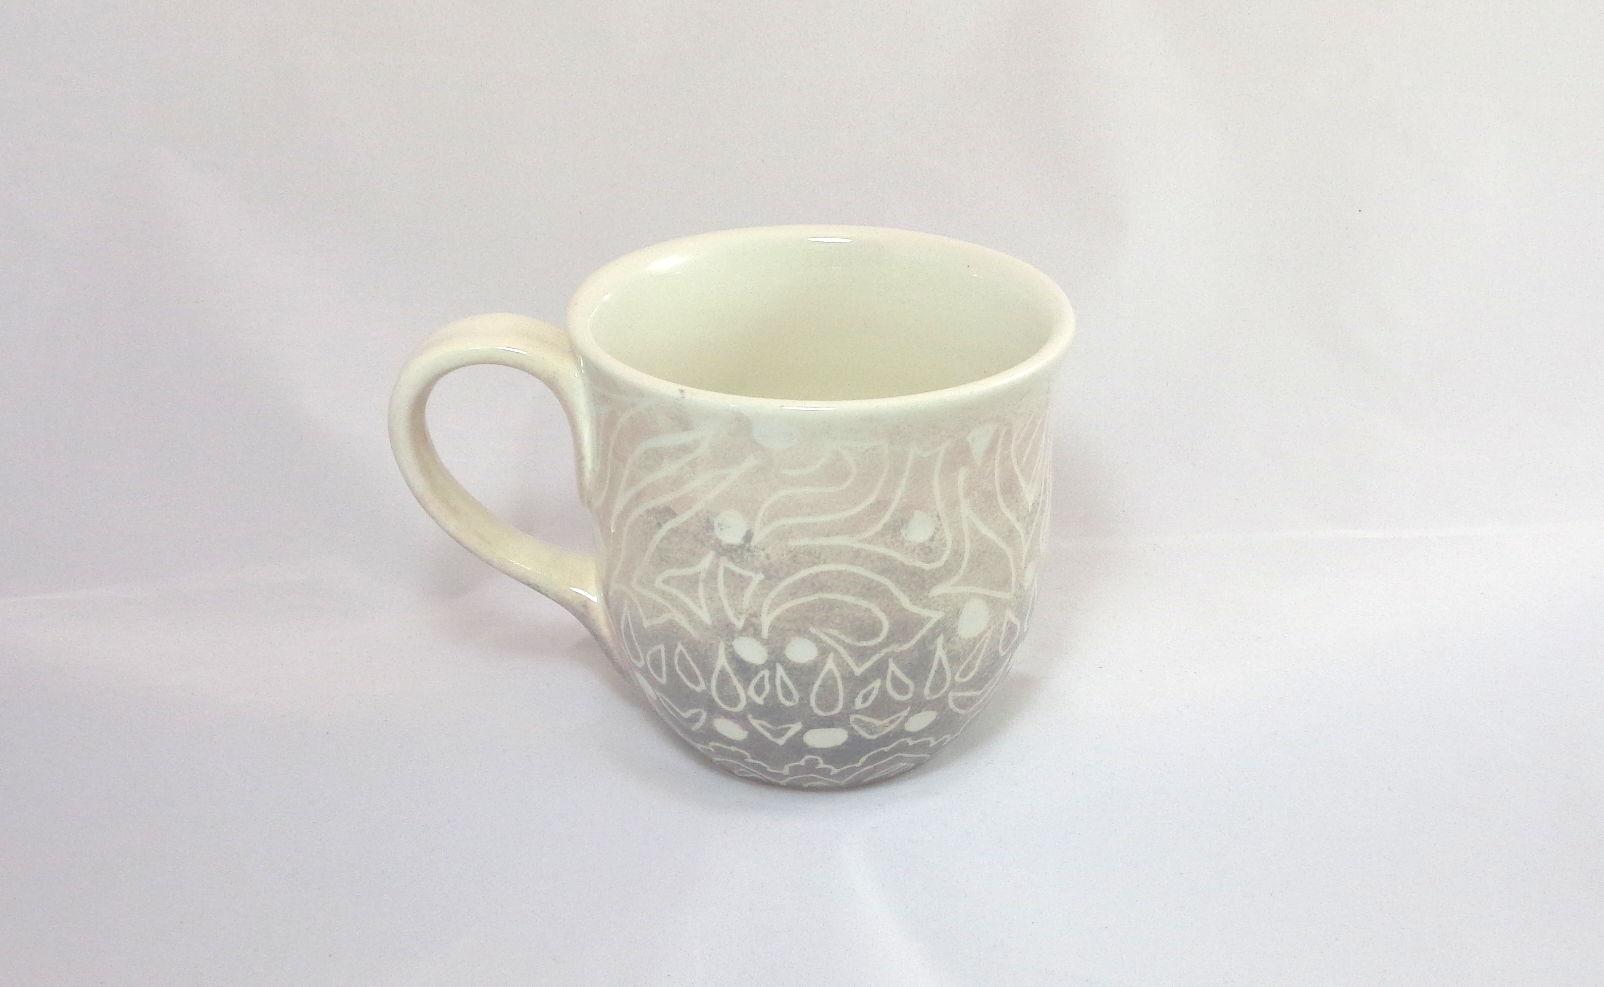 Bemalte Keramik Töpferbecher Ornamente